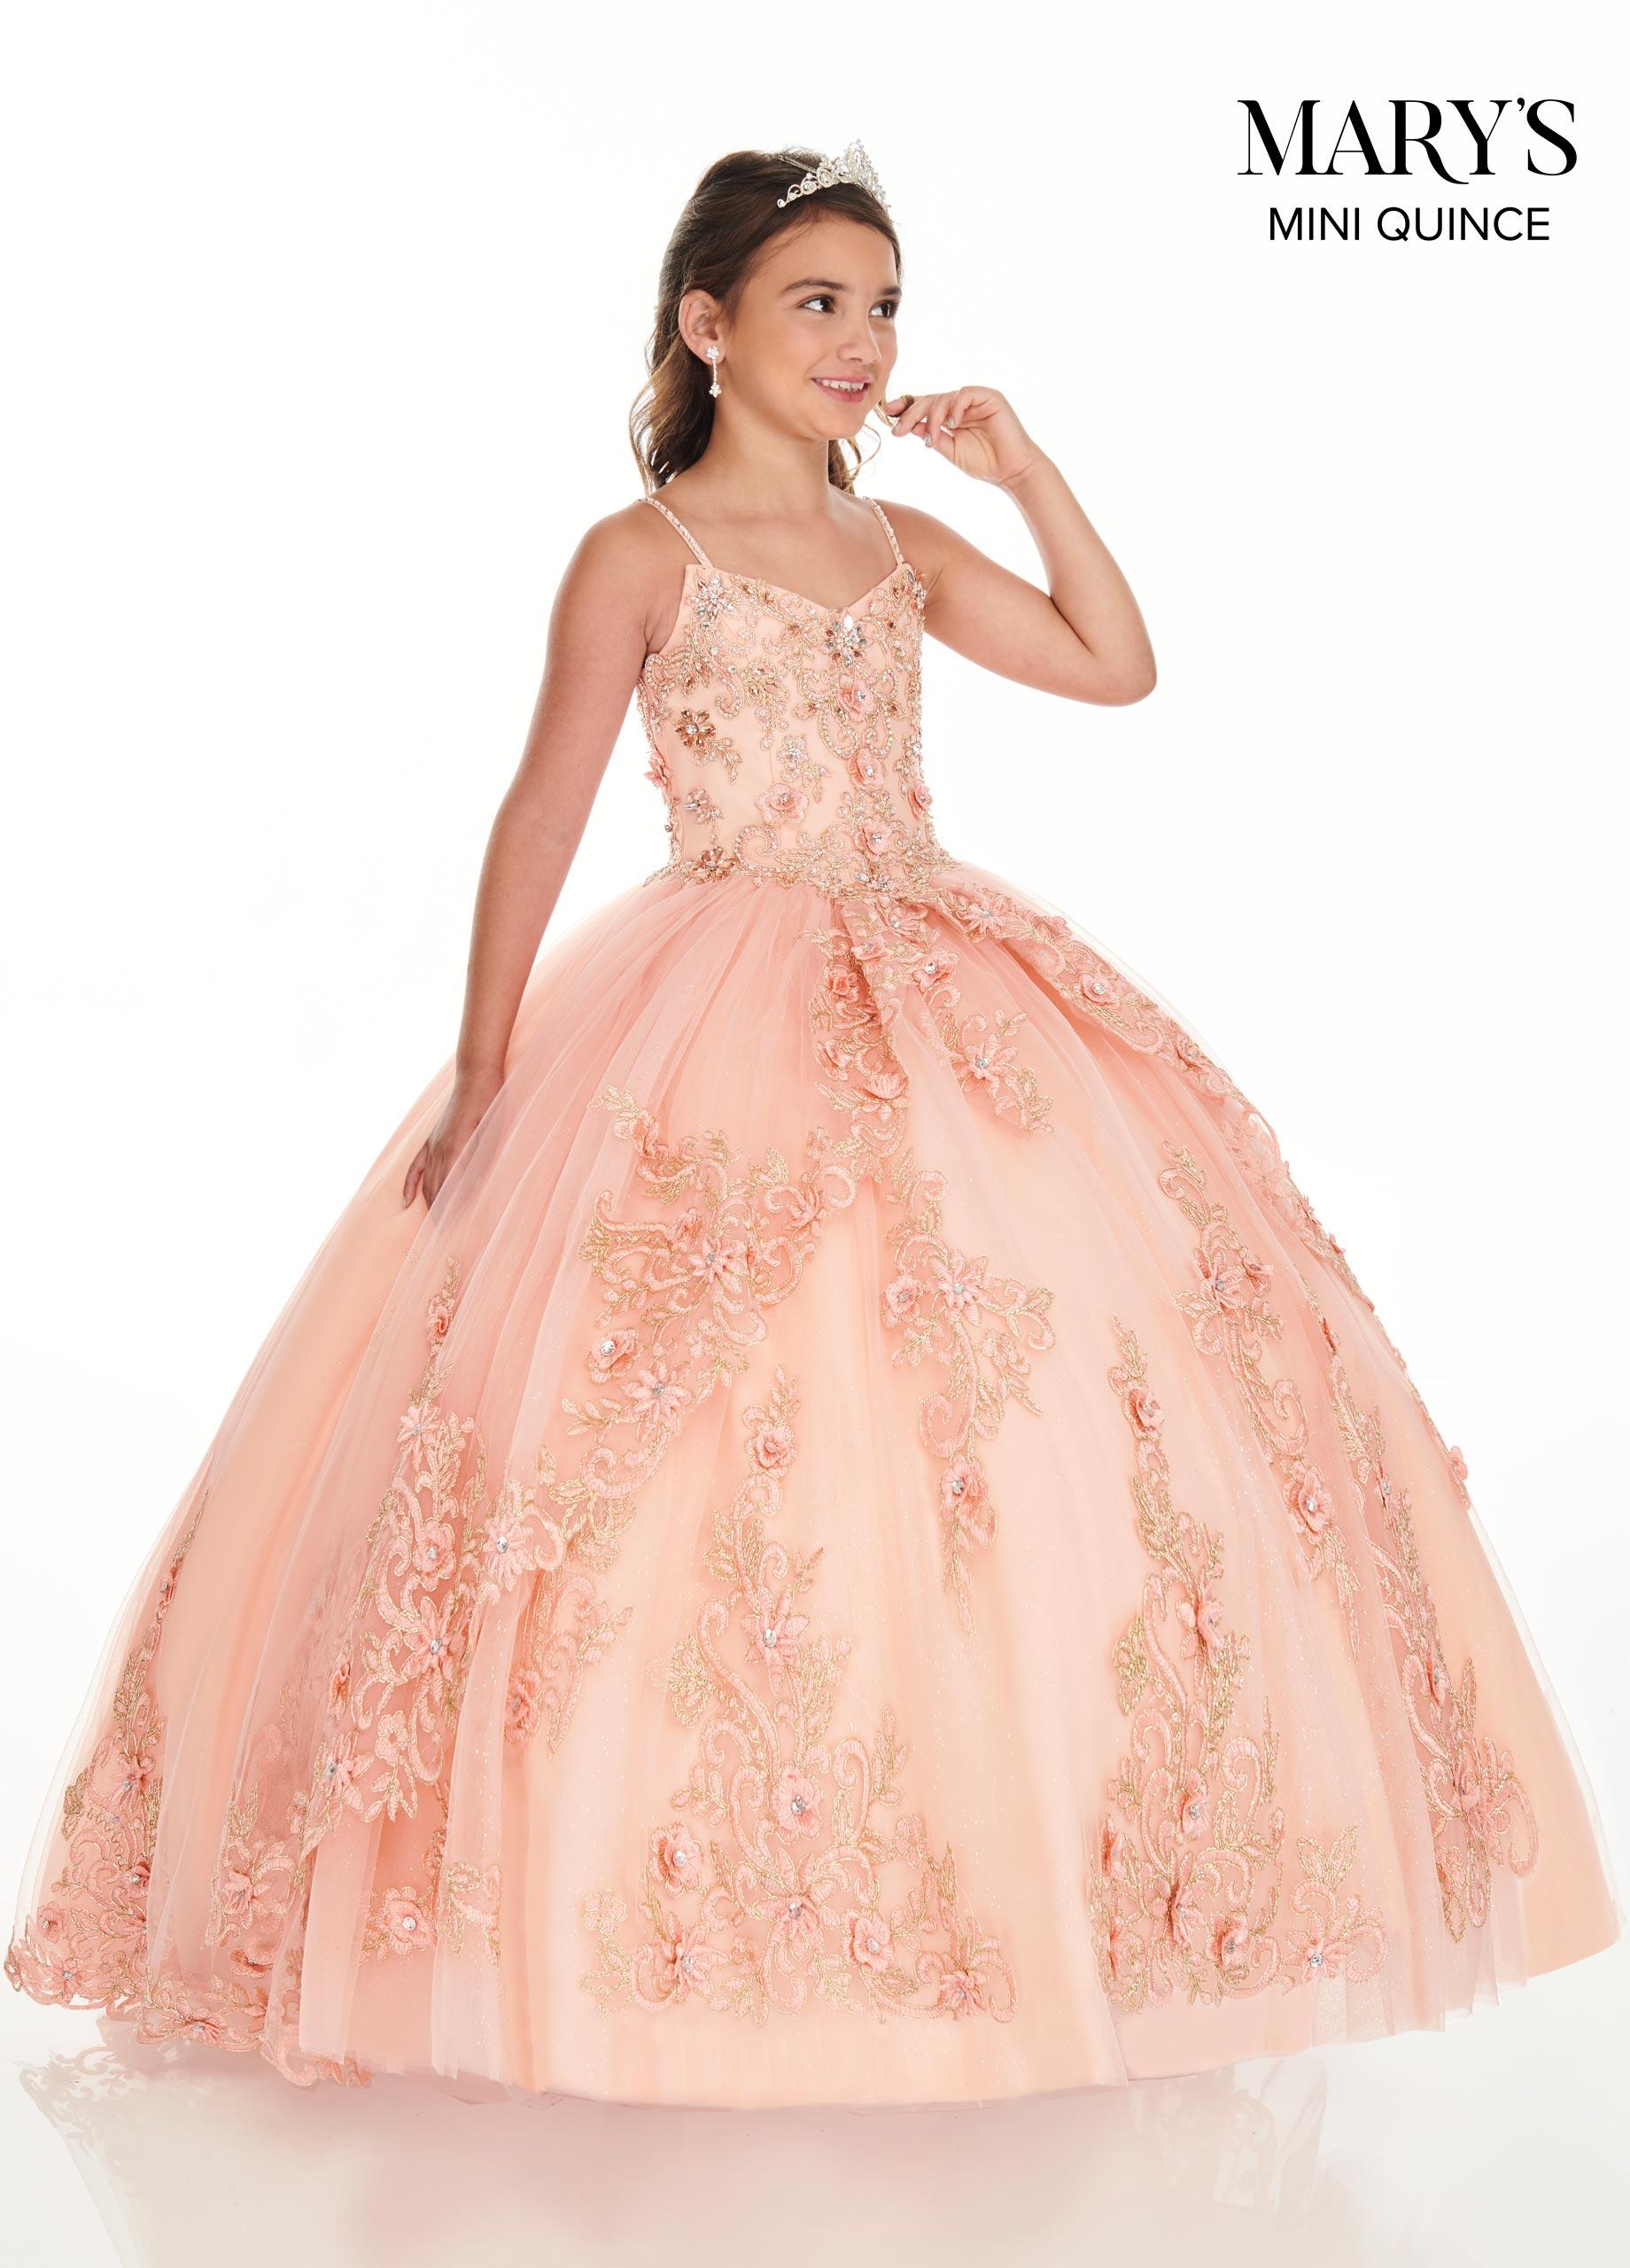 Little Quince Dresses | Mini Quince | Style - MQ4020